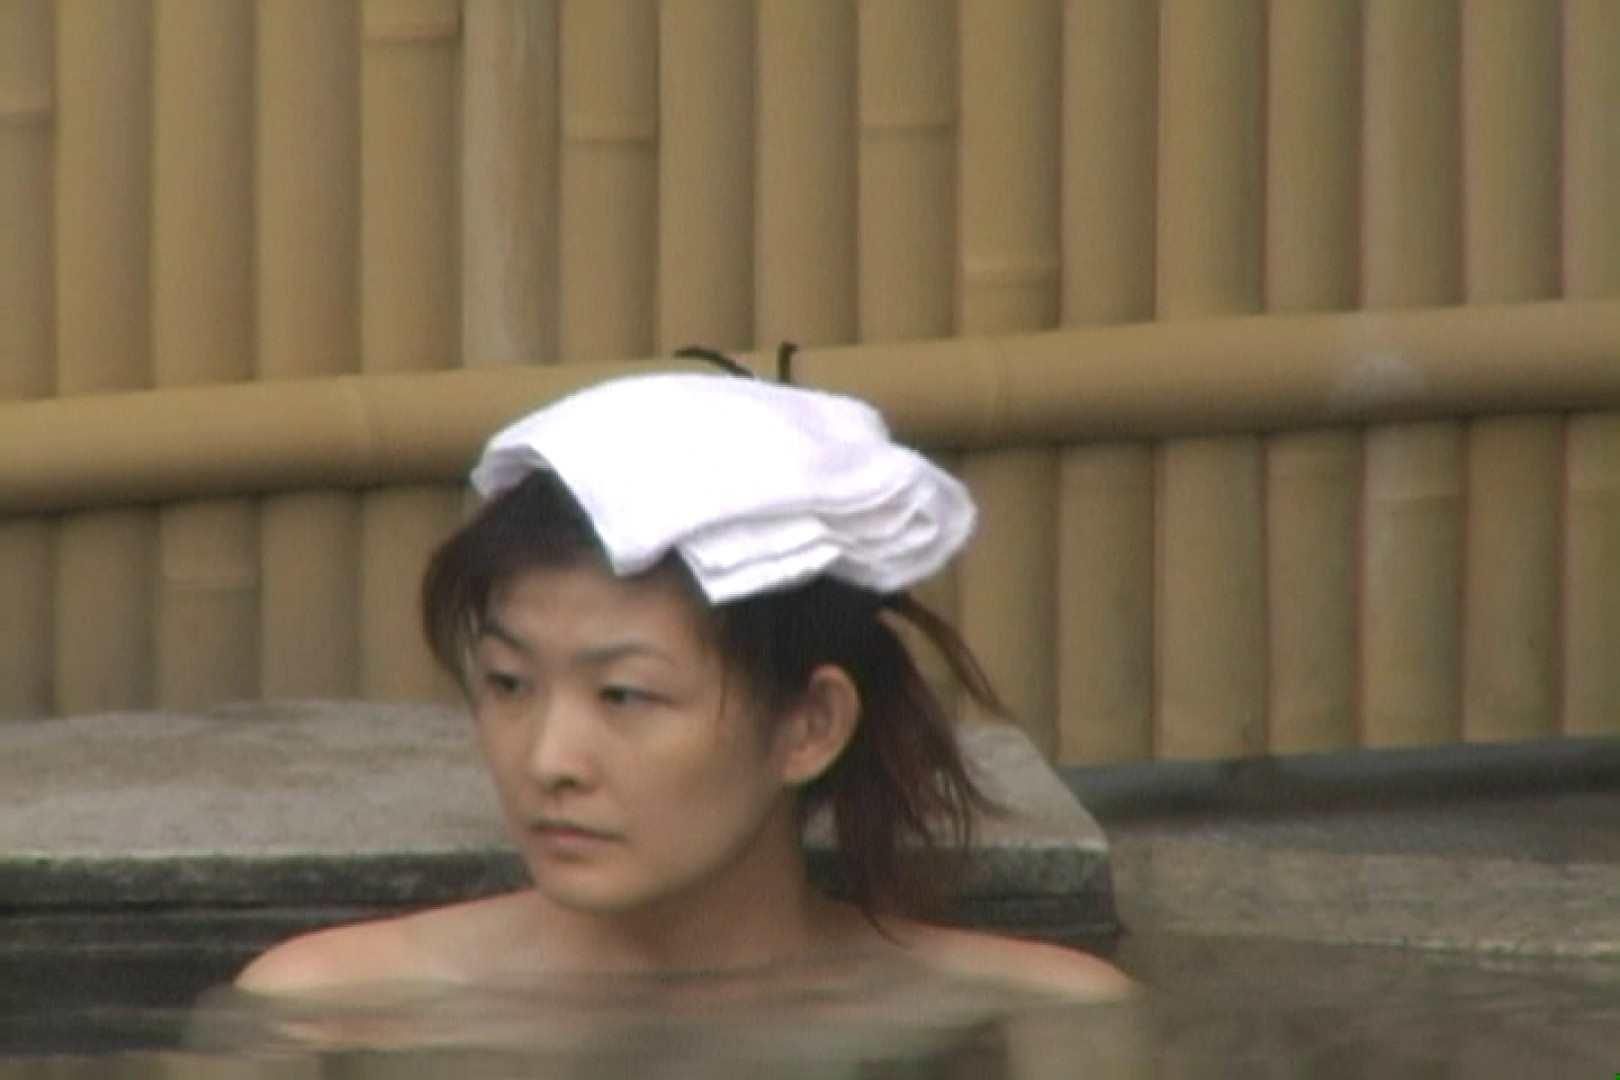 Aquaな露天風呂Vol.611 OLのエロ生活 おまんこ無修正動画無料 18連発 11